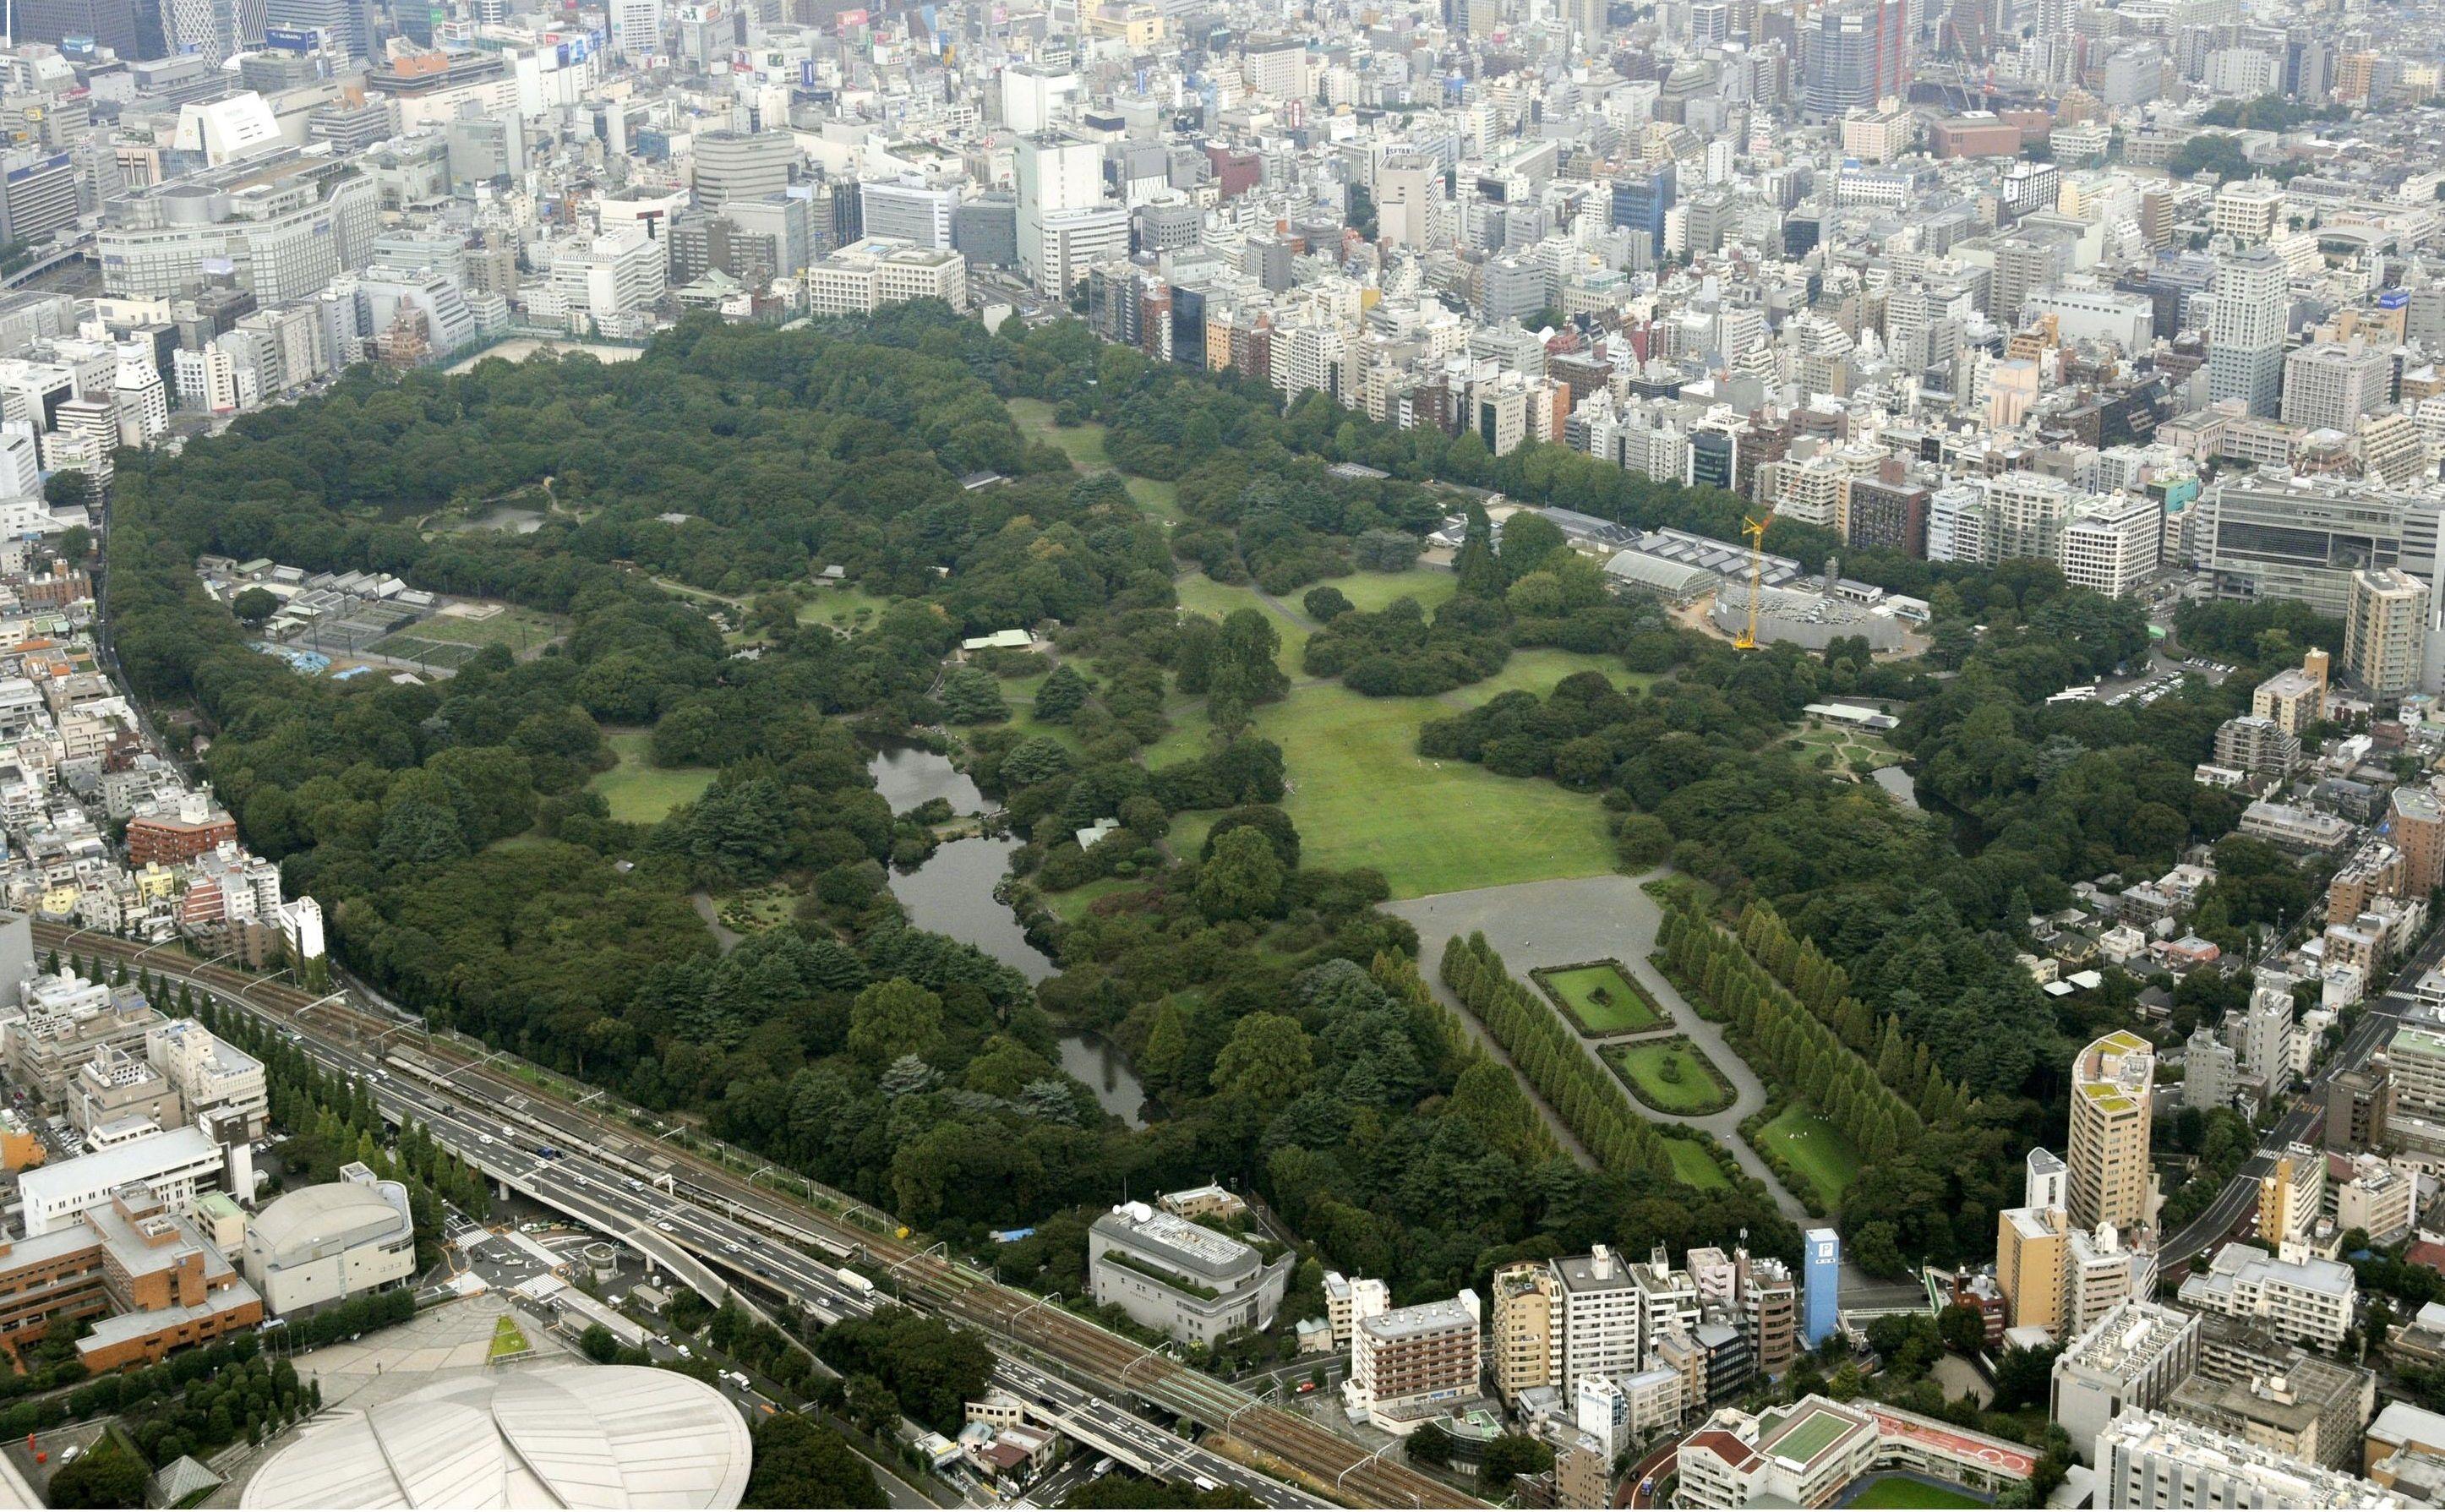 Shinjuku, le centre économique 28b8995b971fe6dcd433efb78ab2764c